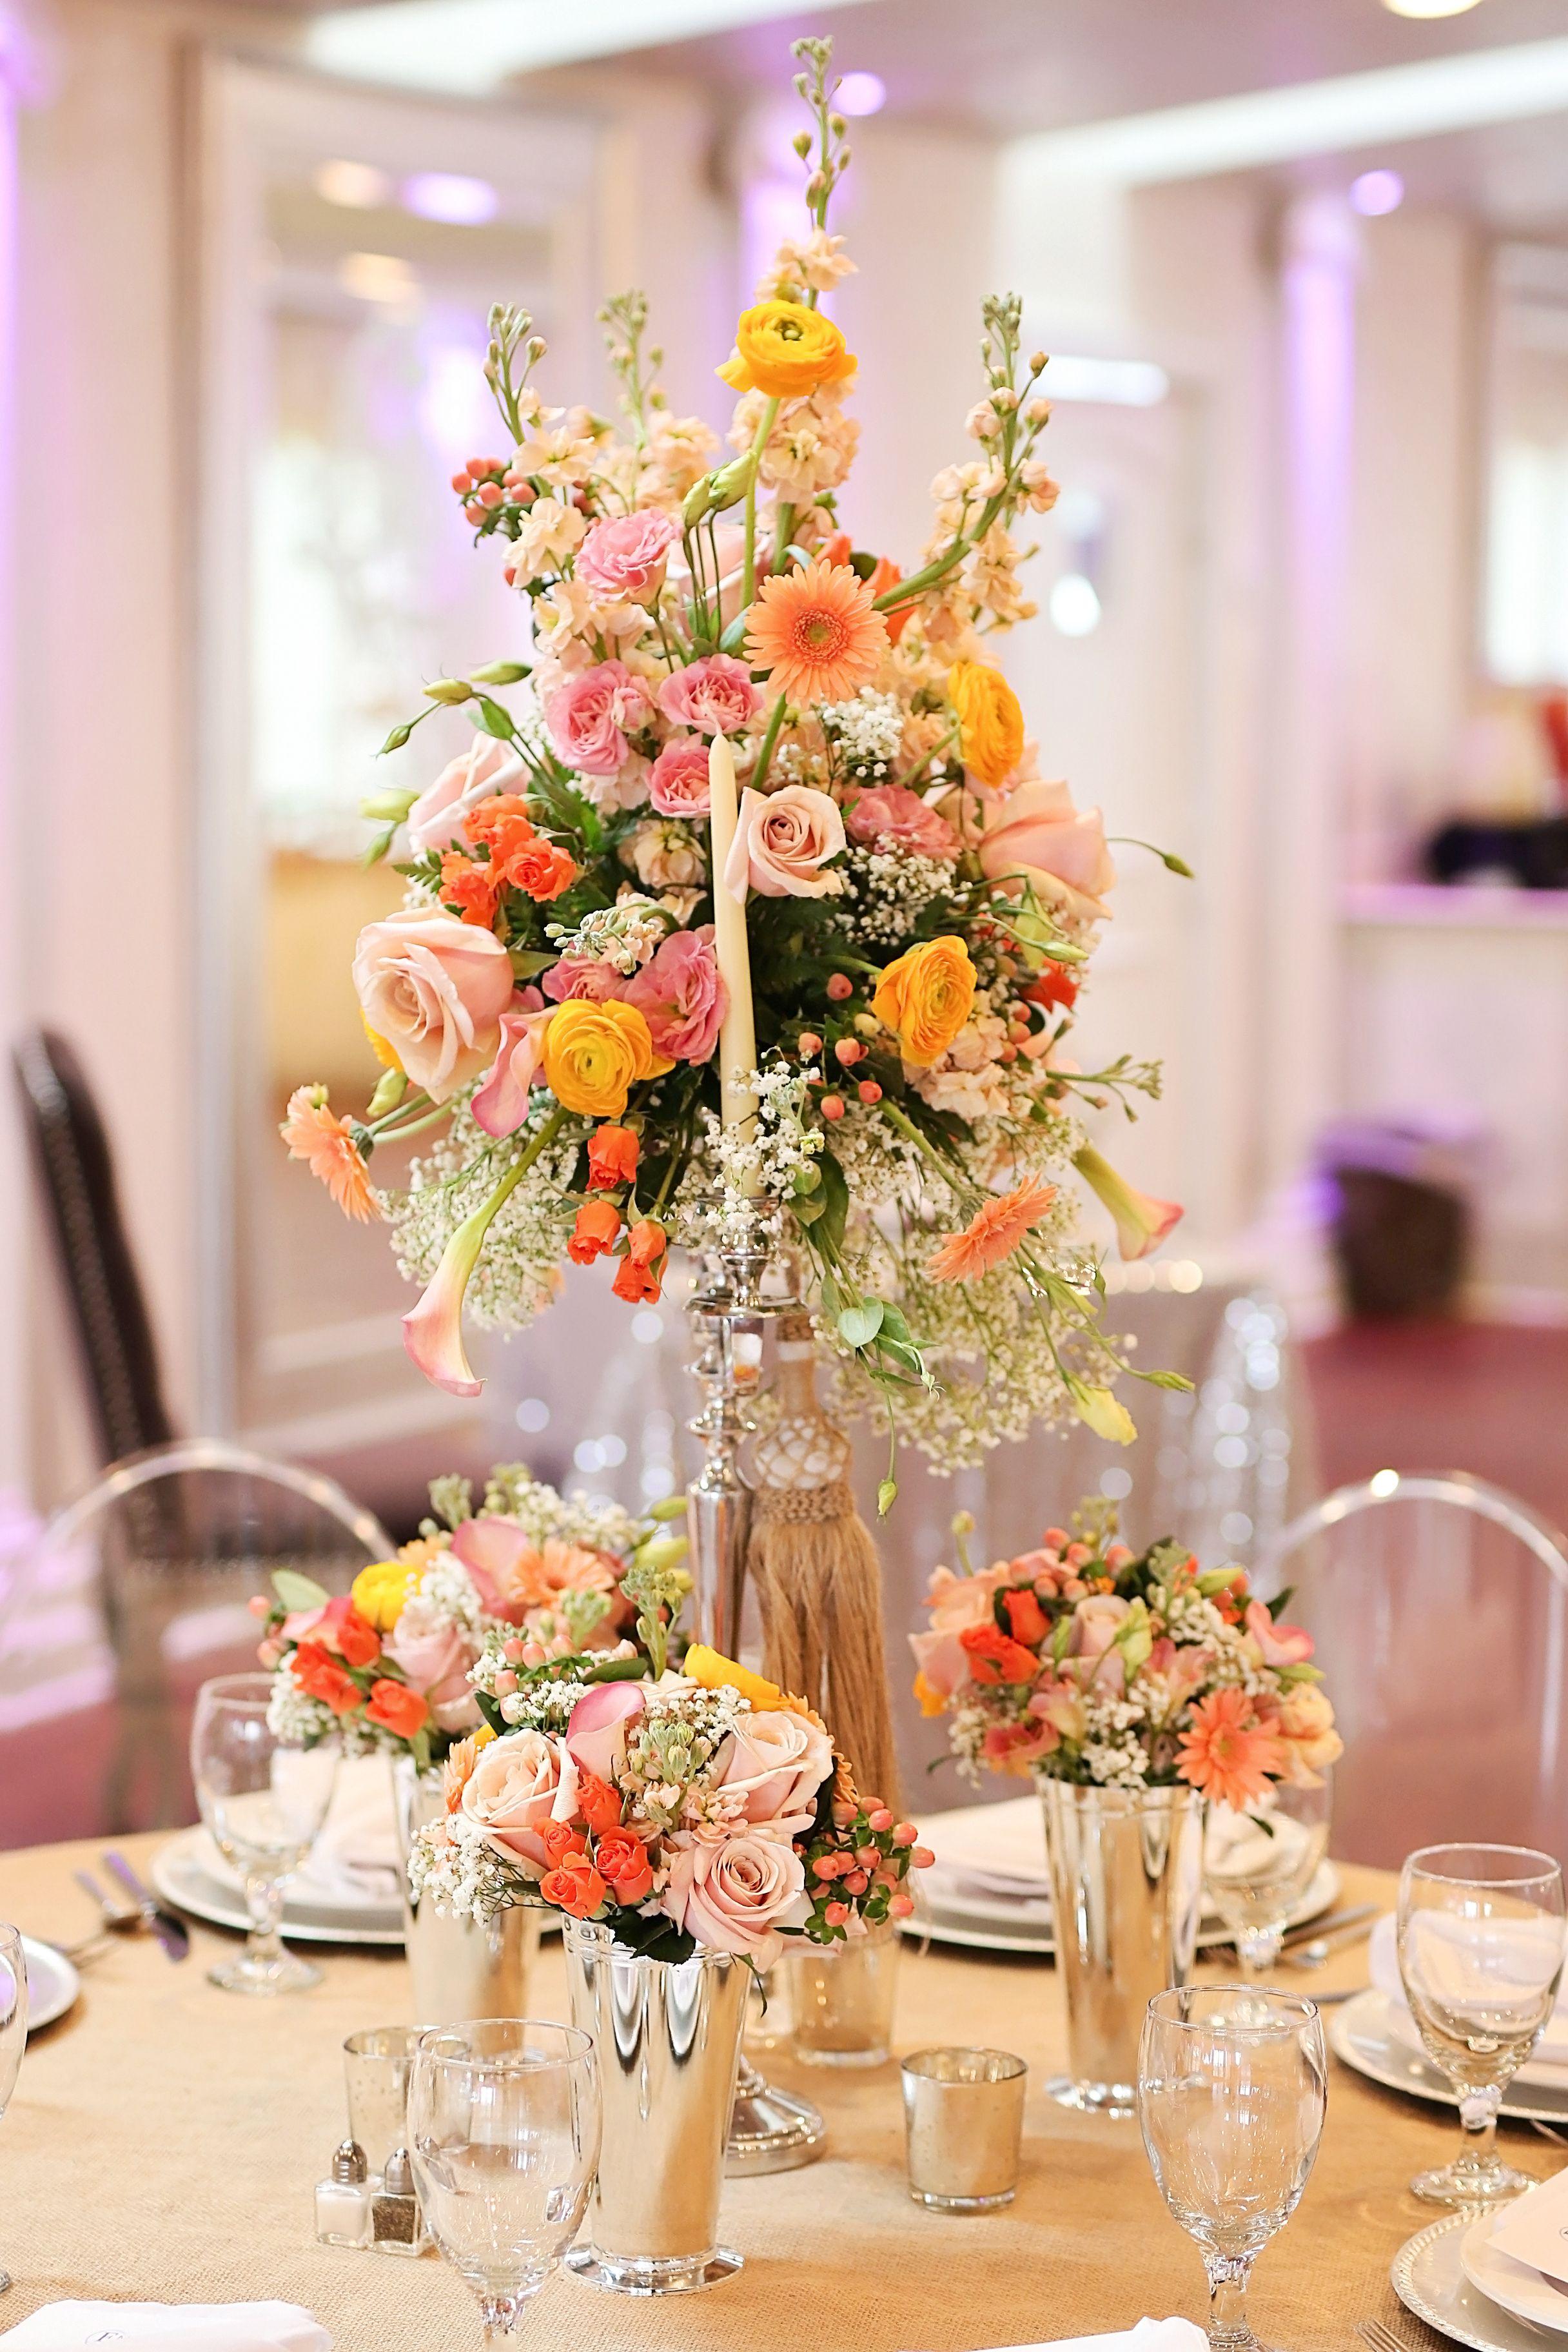 Tall wedding reception floral centerpiece with peach gerbera daisies, … |  Orange wedding centerpieces, Wedding flower centerpieces tall, Flower  centerpieces wedding